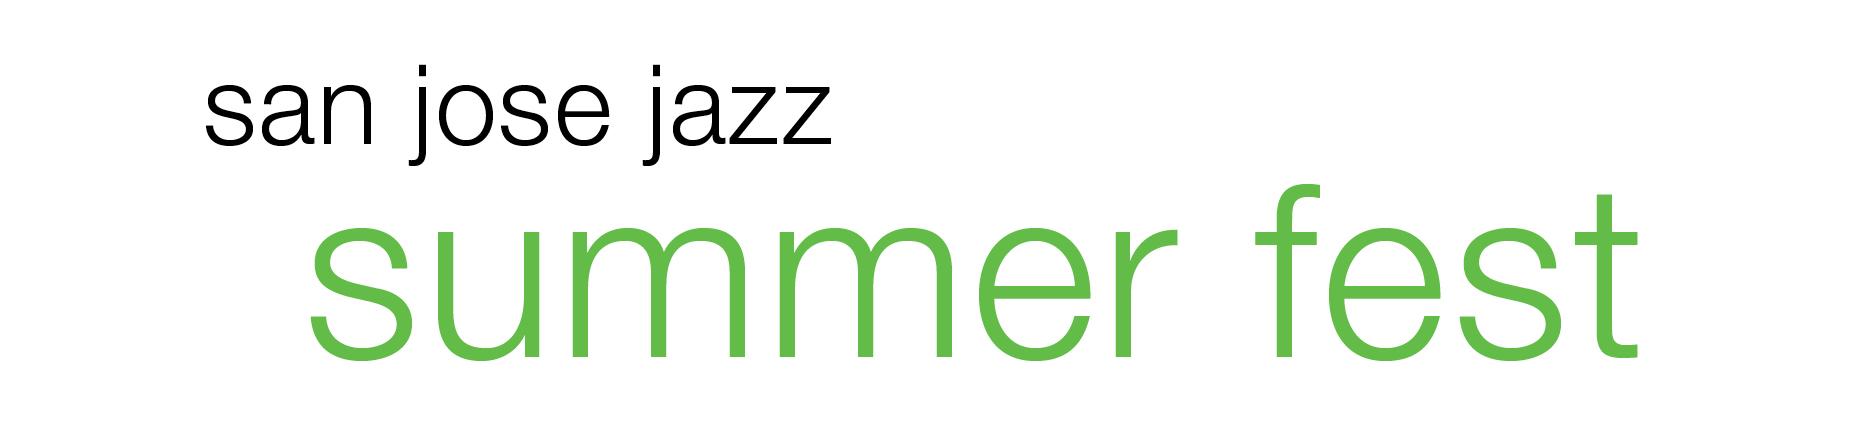 San Jose Jazz Summer Fest